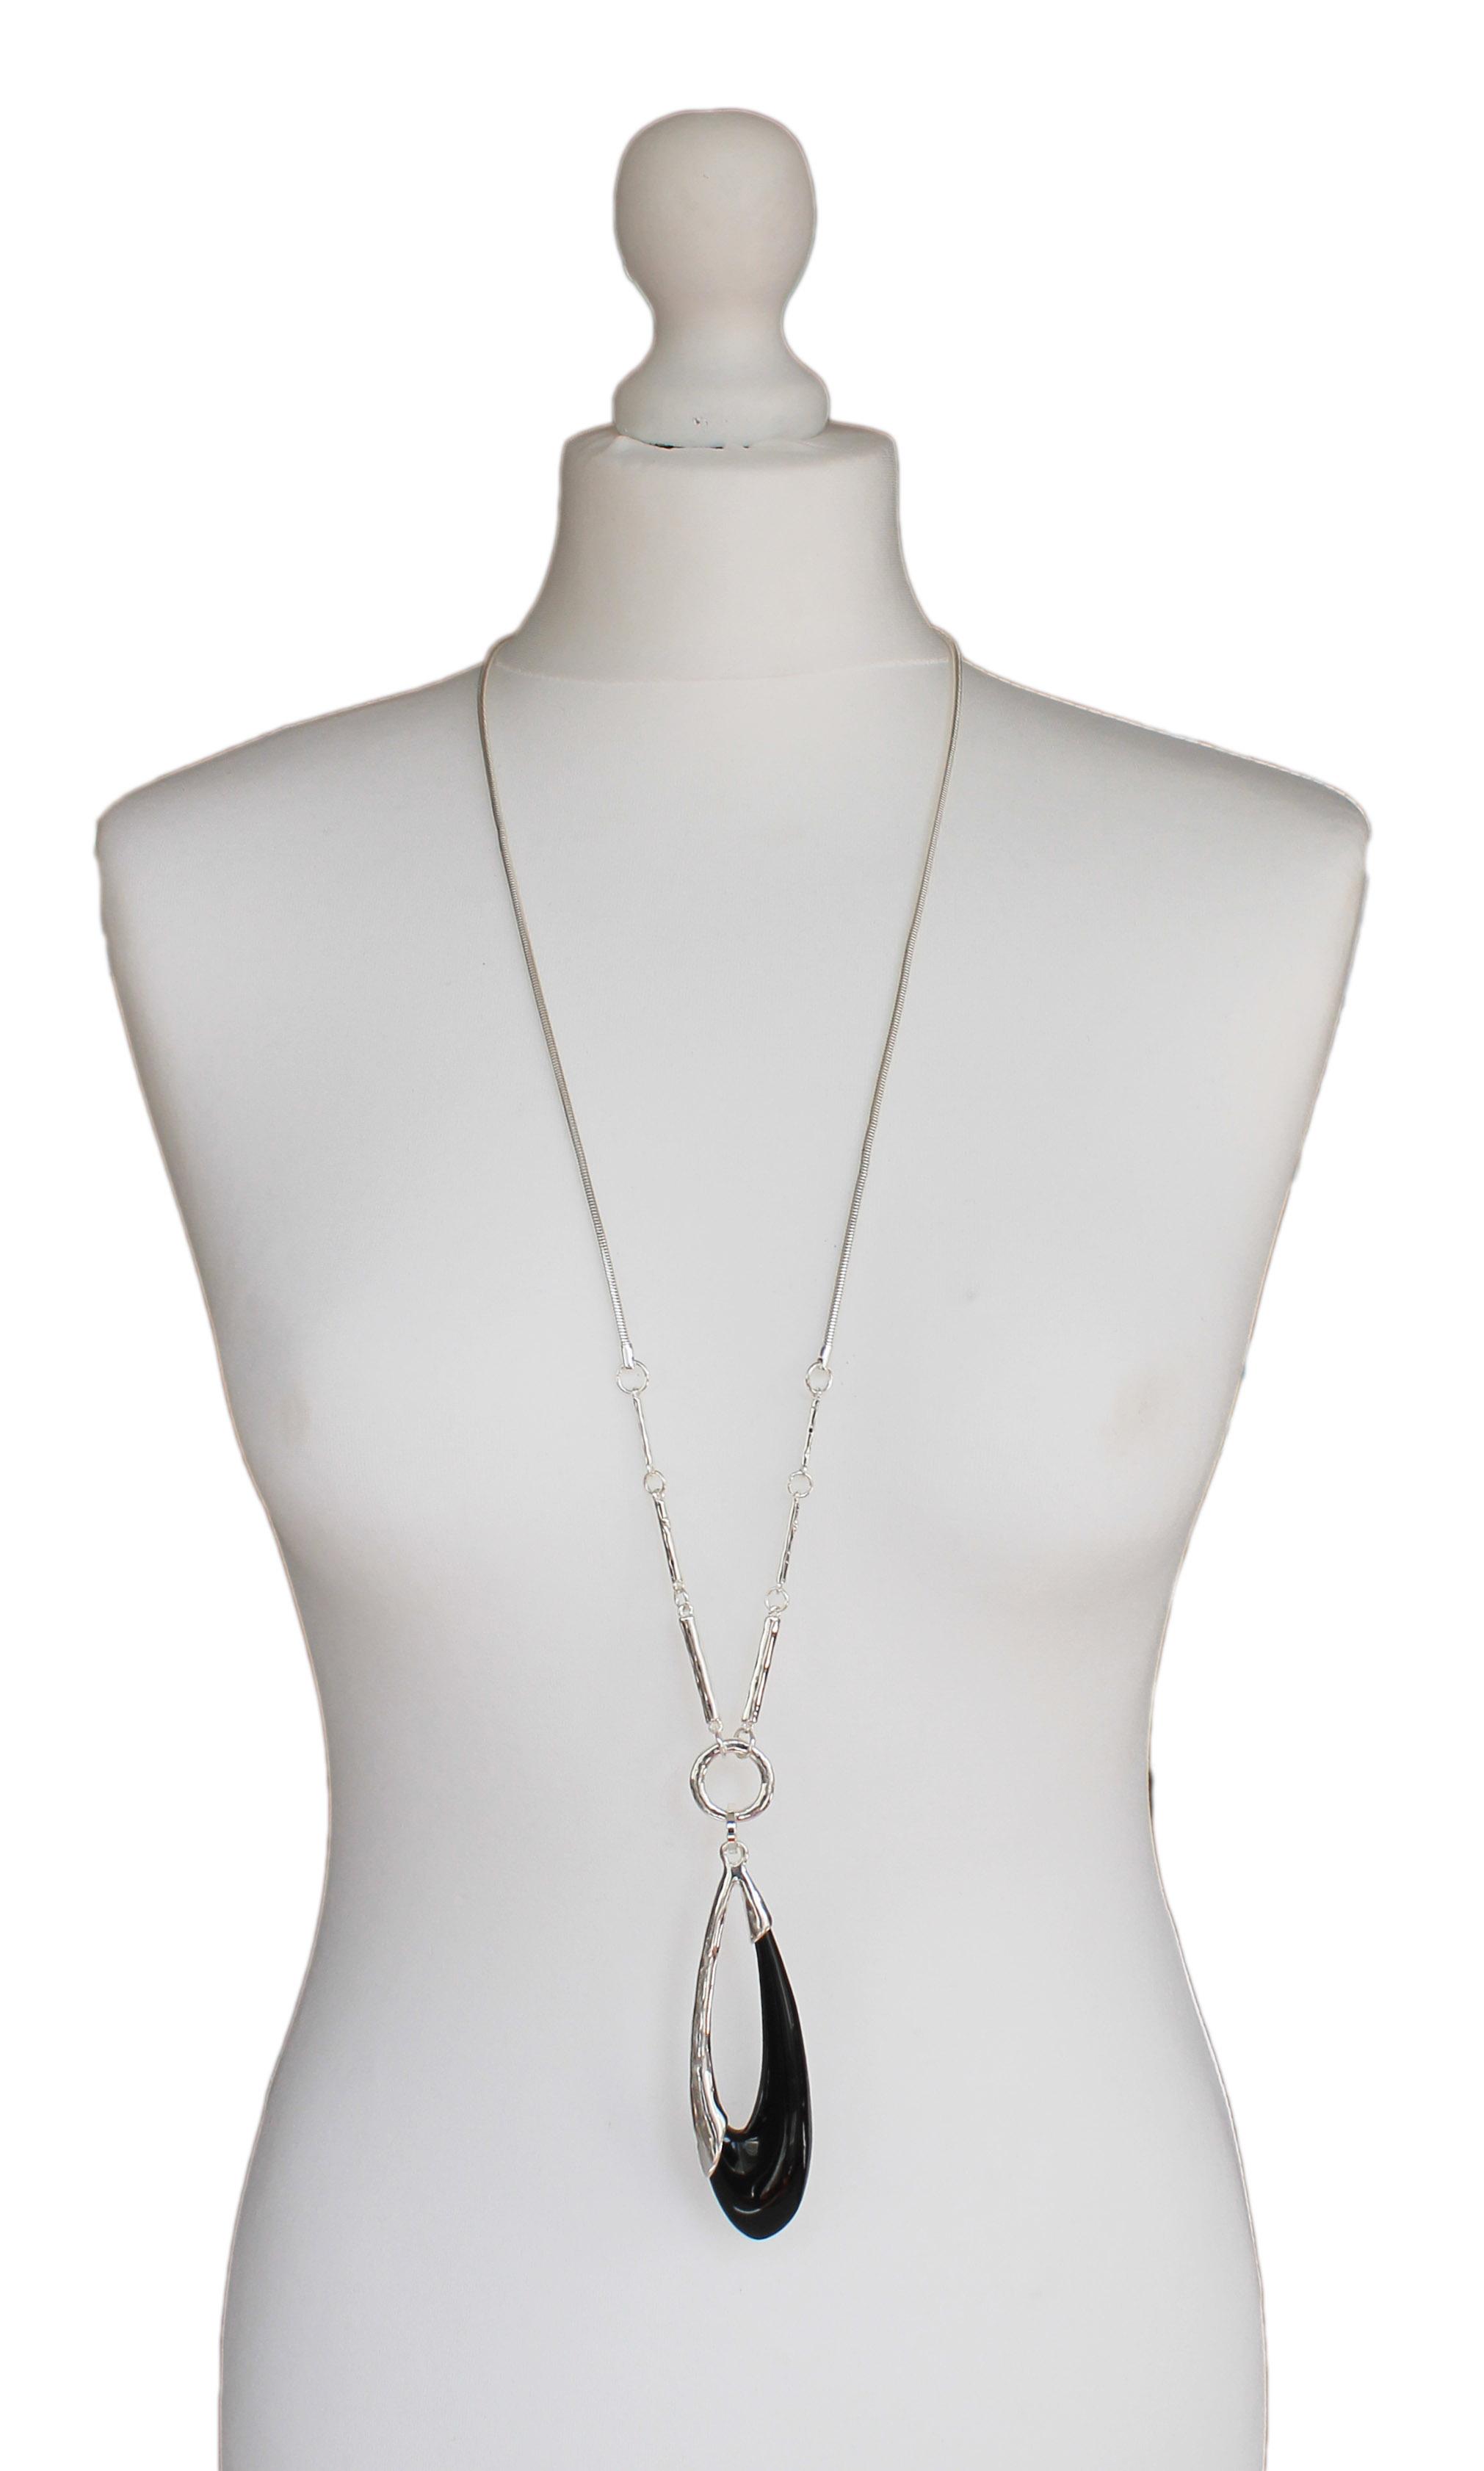 Silver Jewellery Black Oval Necklace